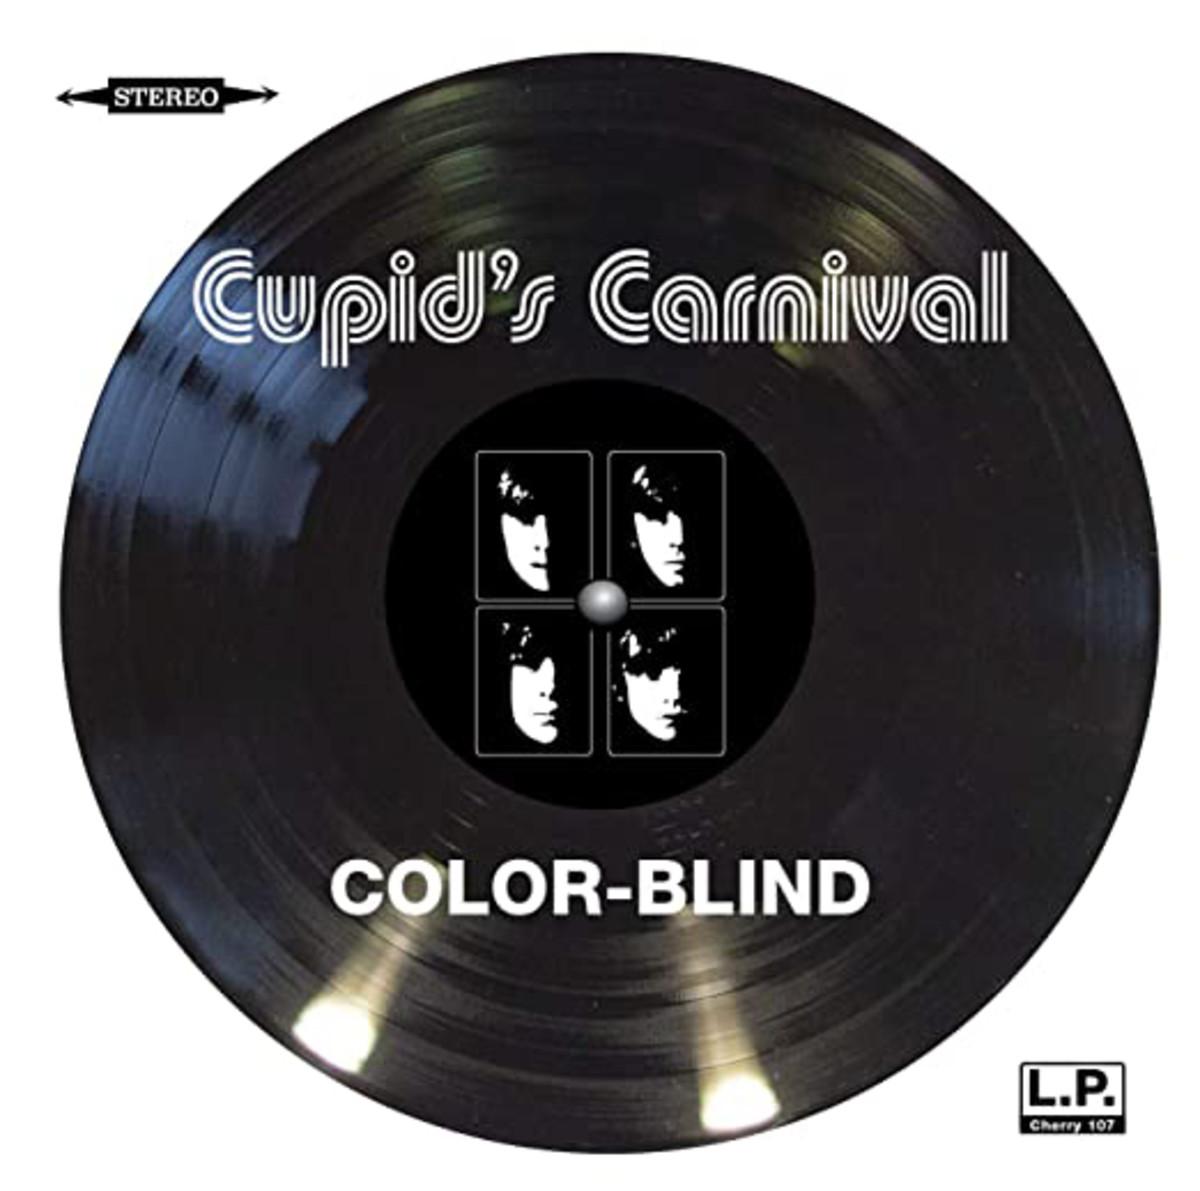 Cupidcolor